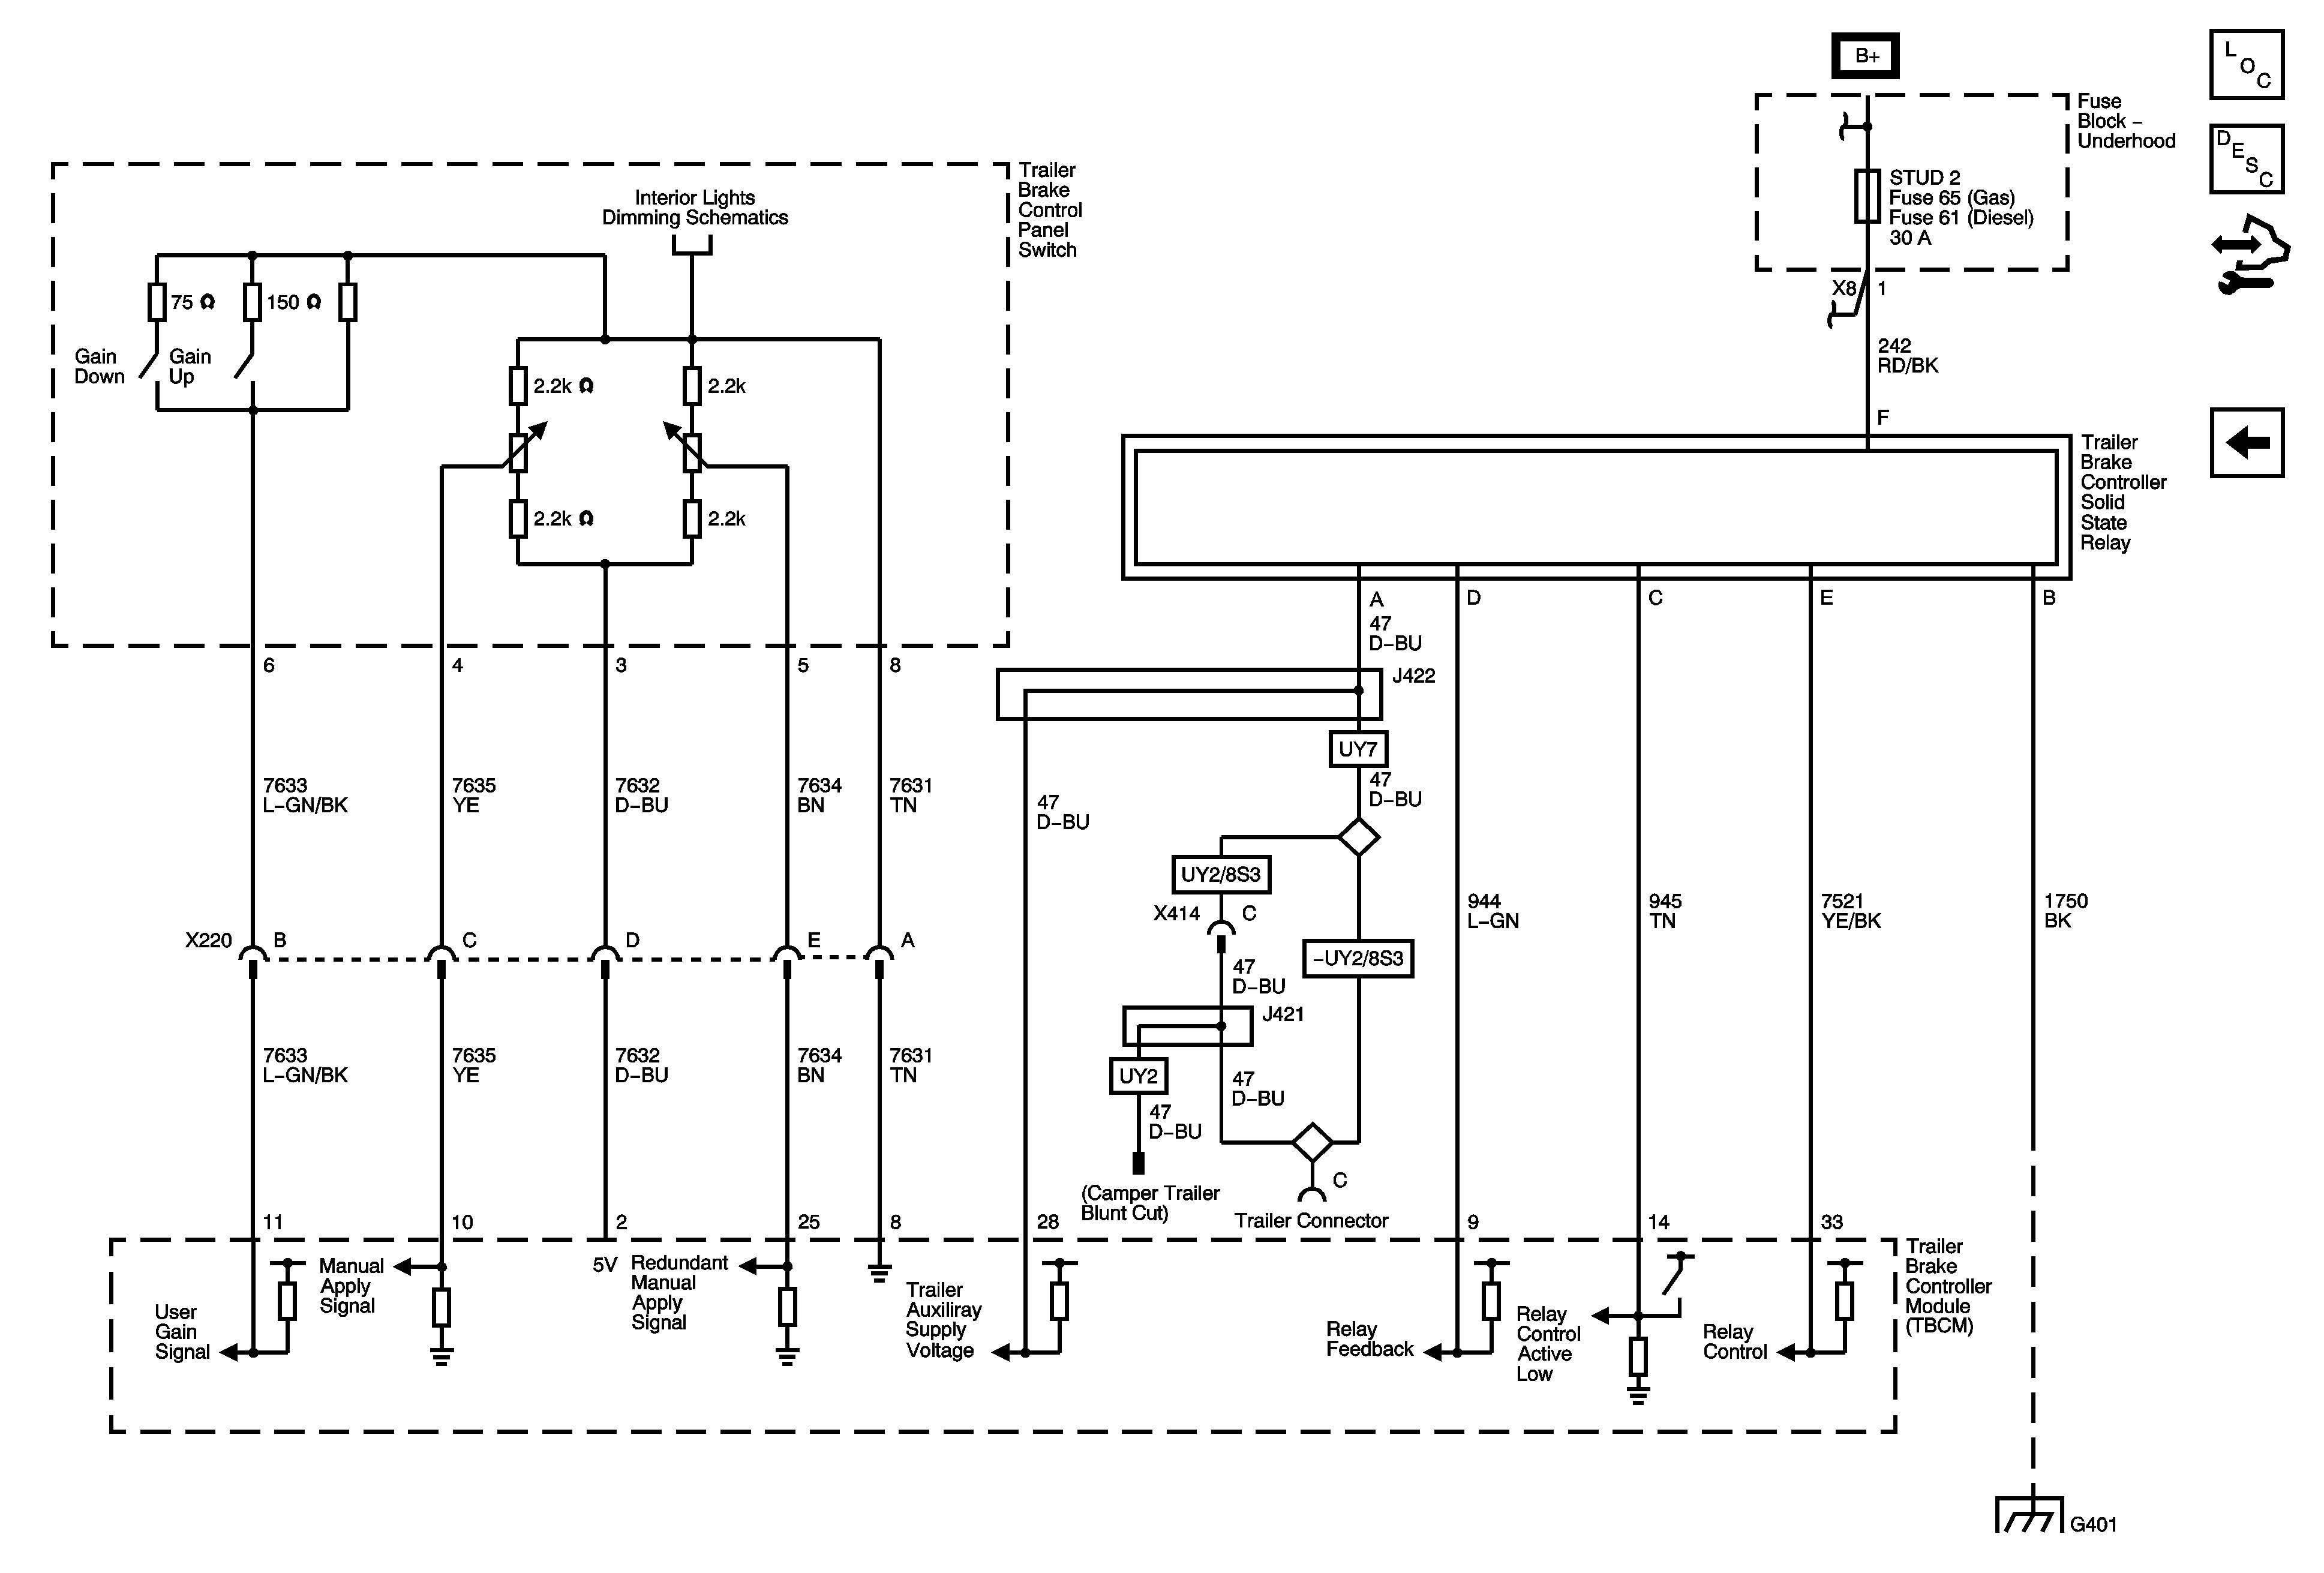 5 wire capacitor wiring diagram, hunter fan on jin you e70469